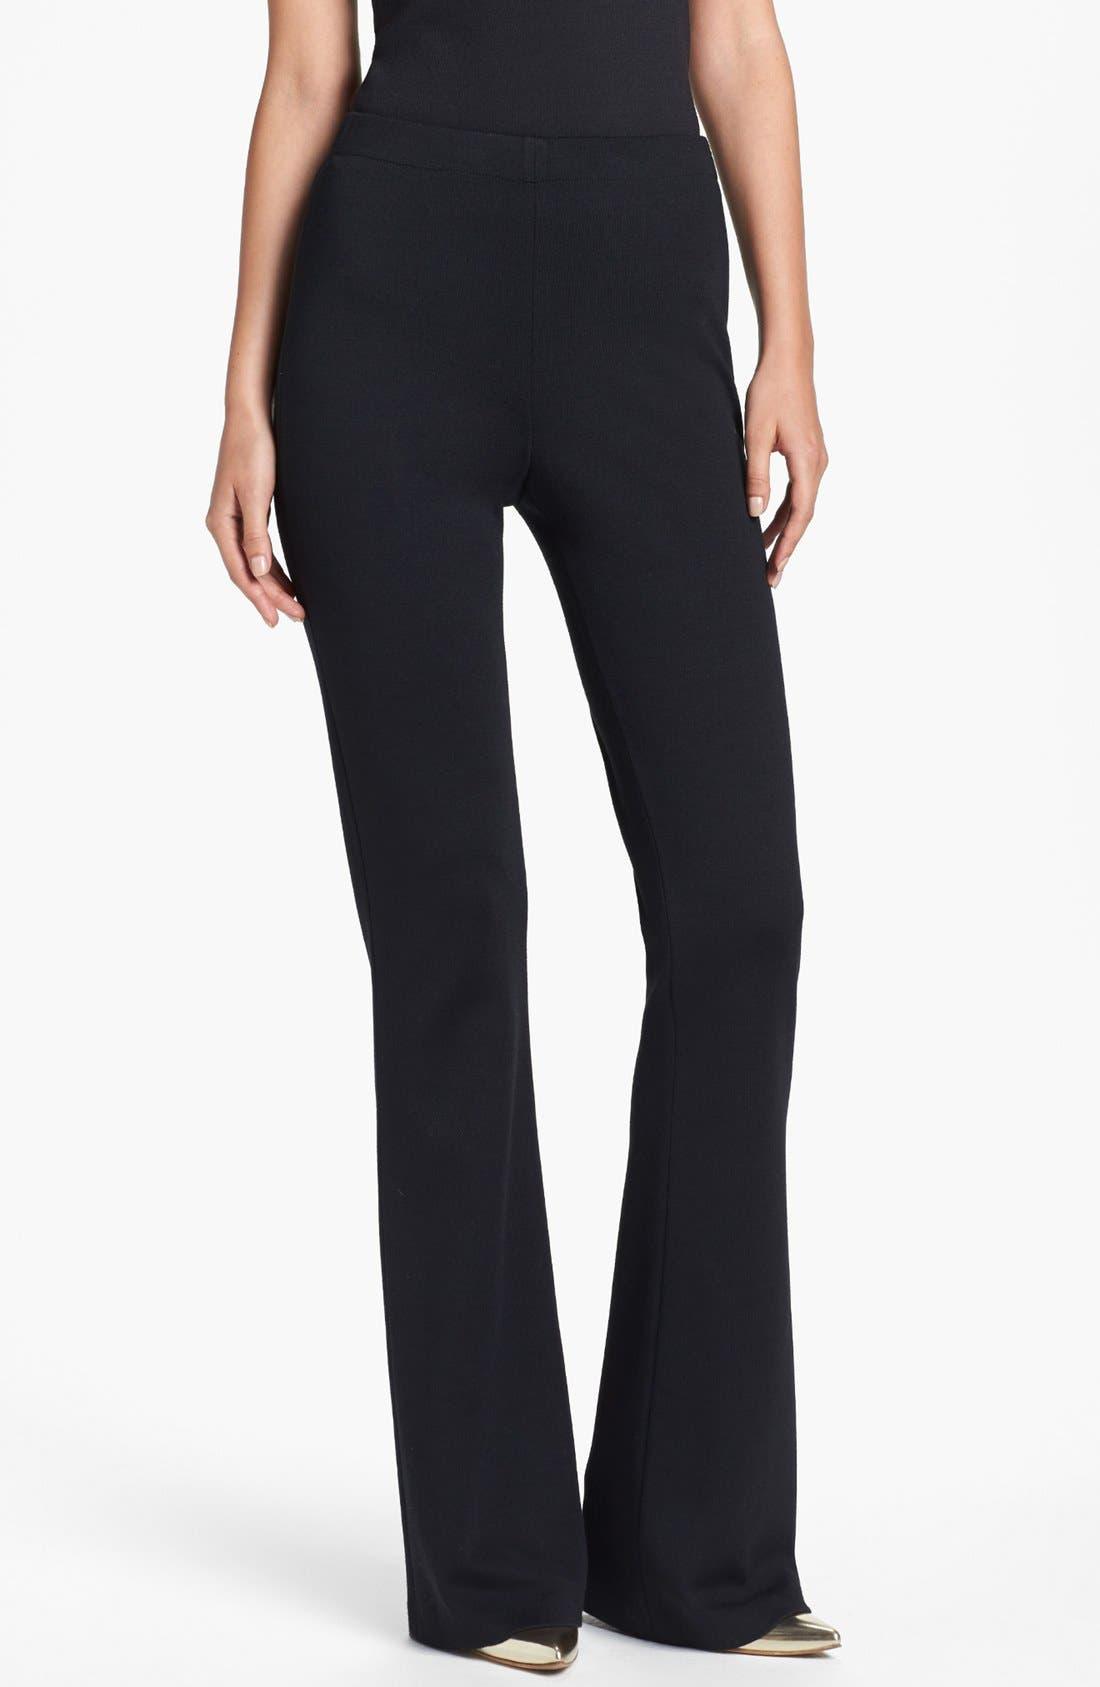 'Kasia' Bootcut Milano Knit Pants,                         Main,                         color, Caviar